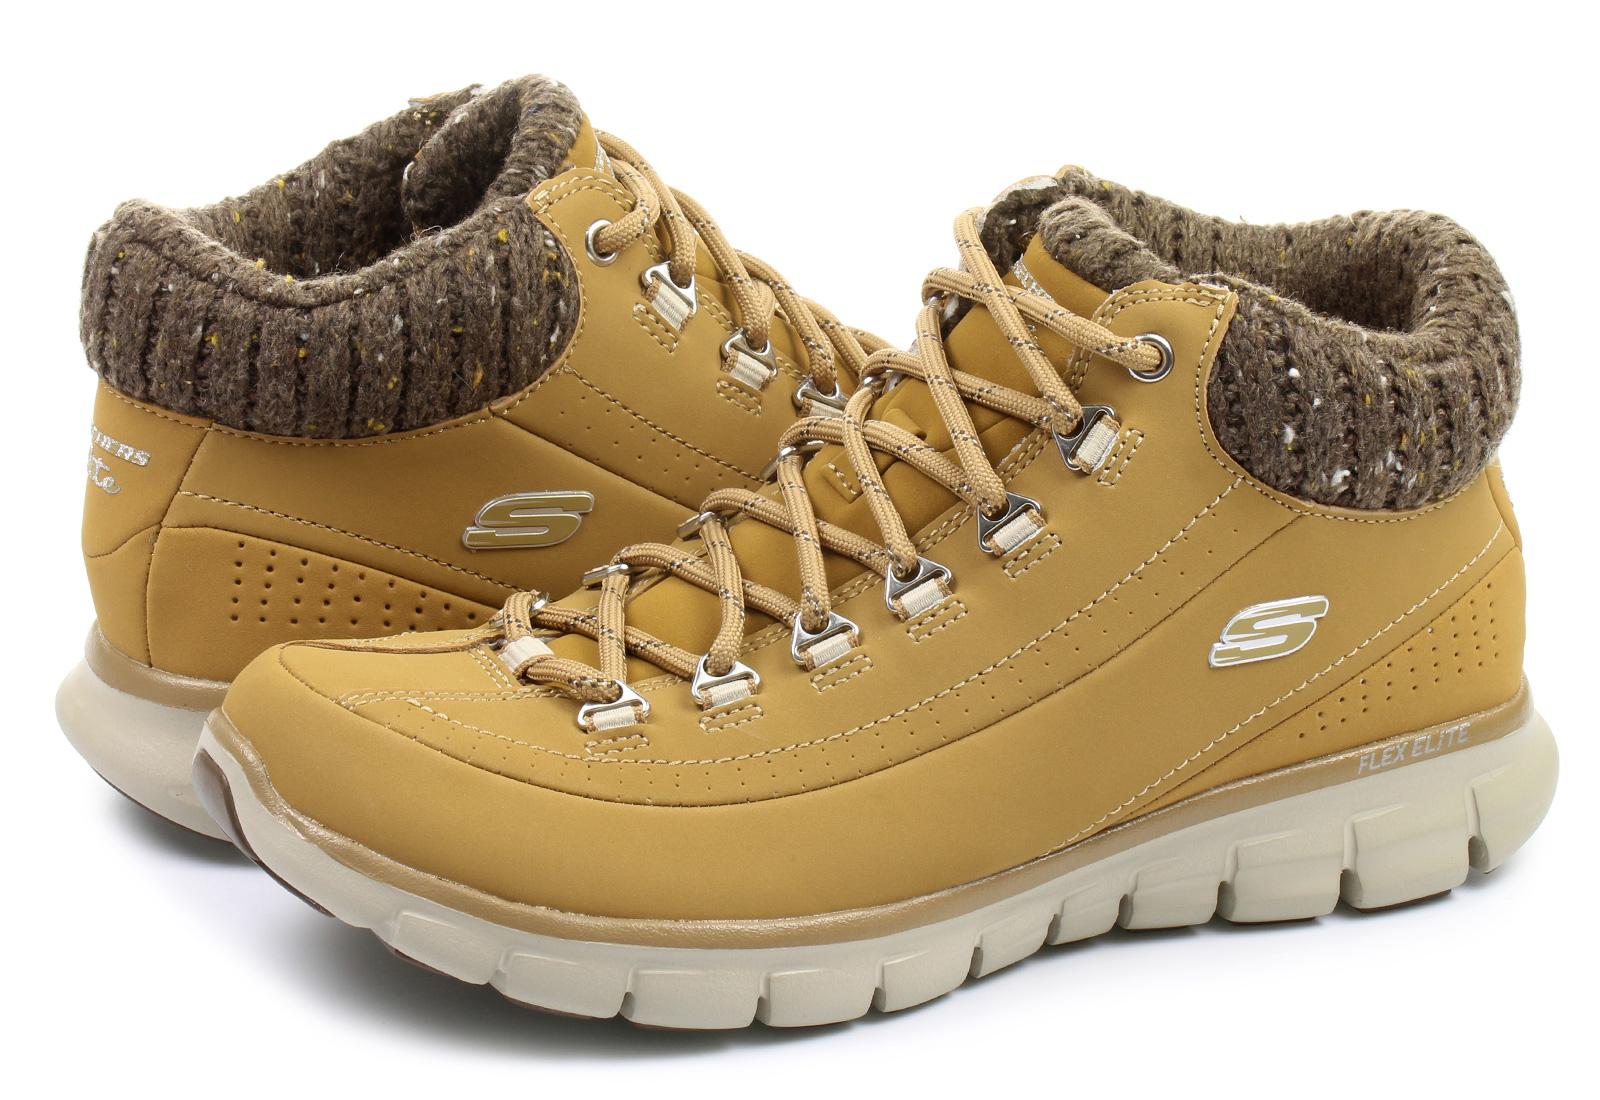 skechers shoes winter nights 12122 wtn shop